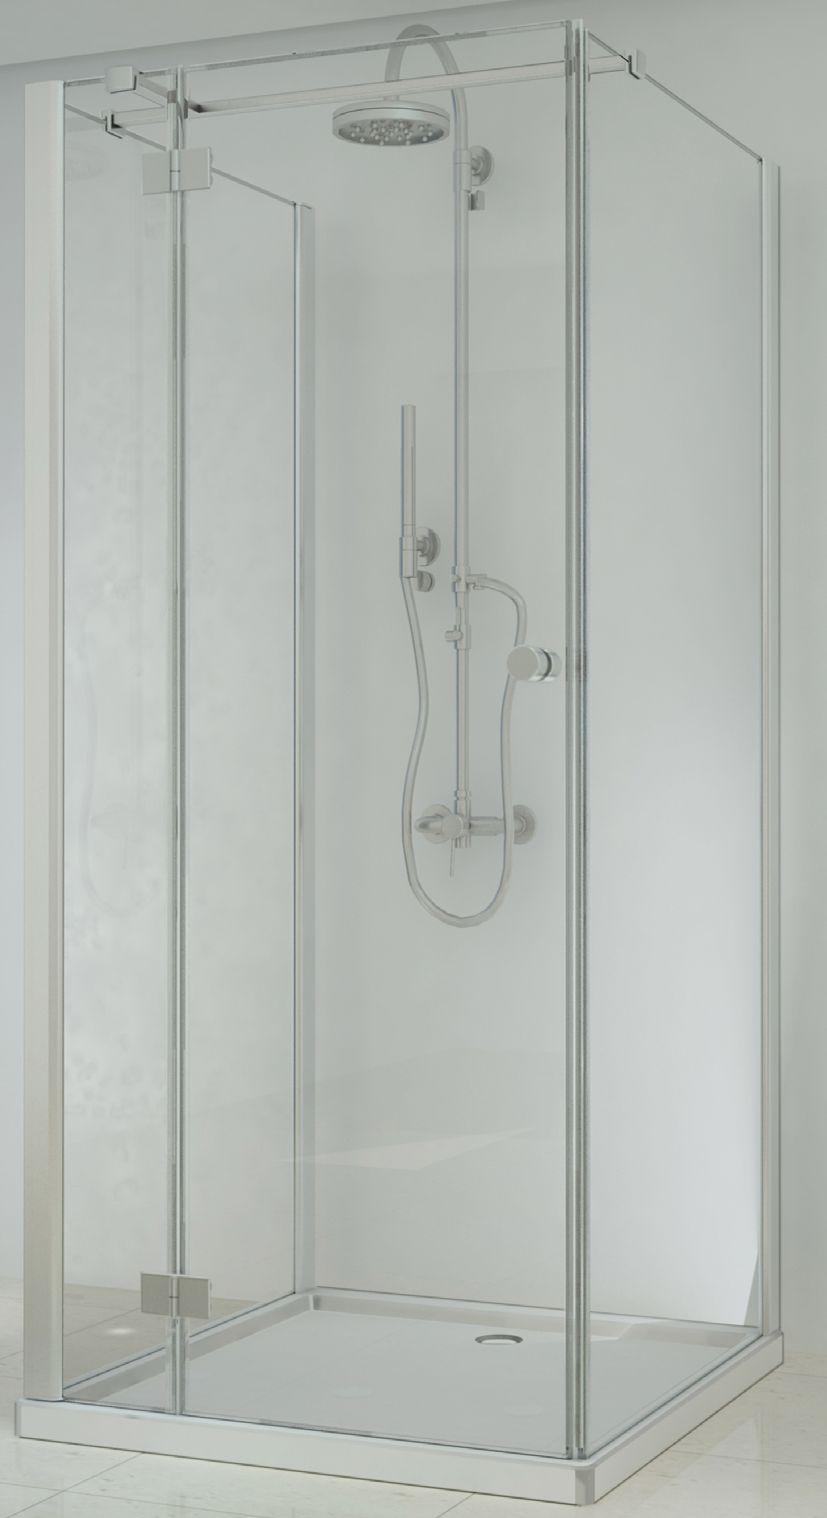 Badstuber Smart vierkante douchecabine 90x90cm 3-delig